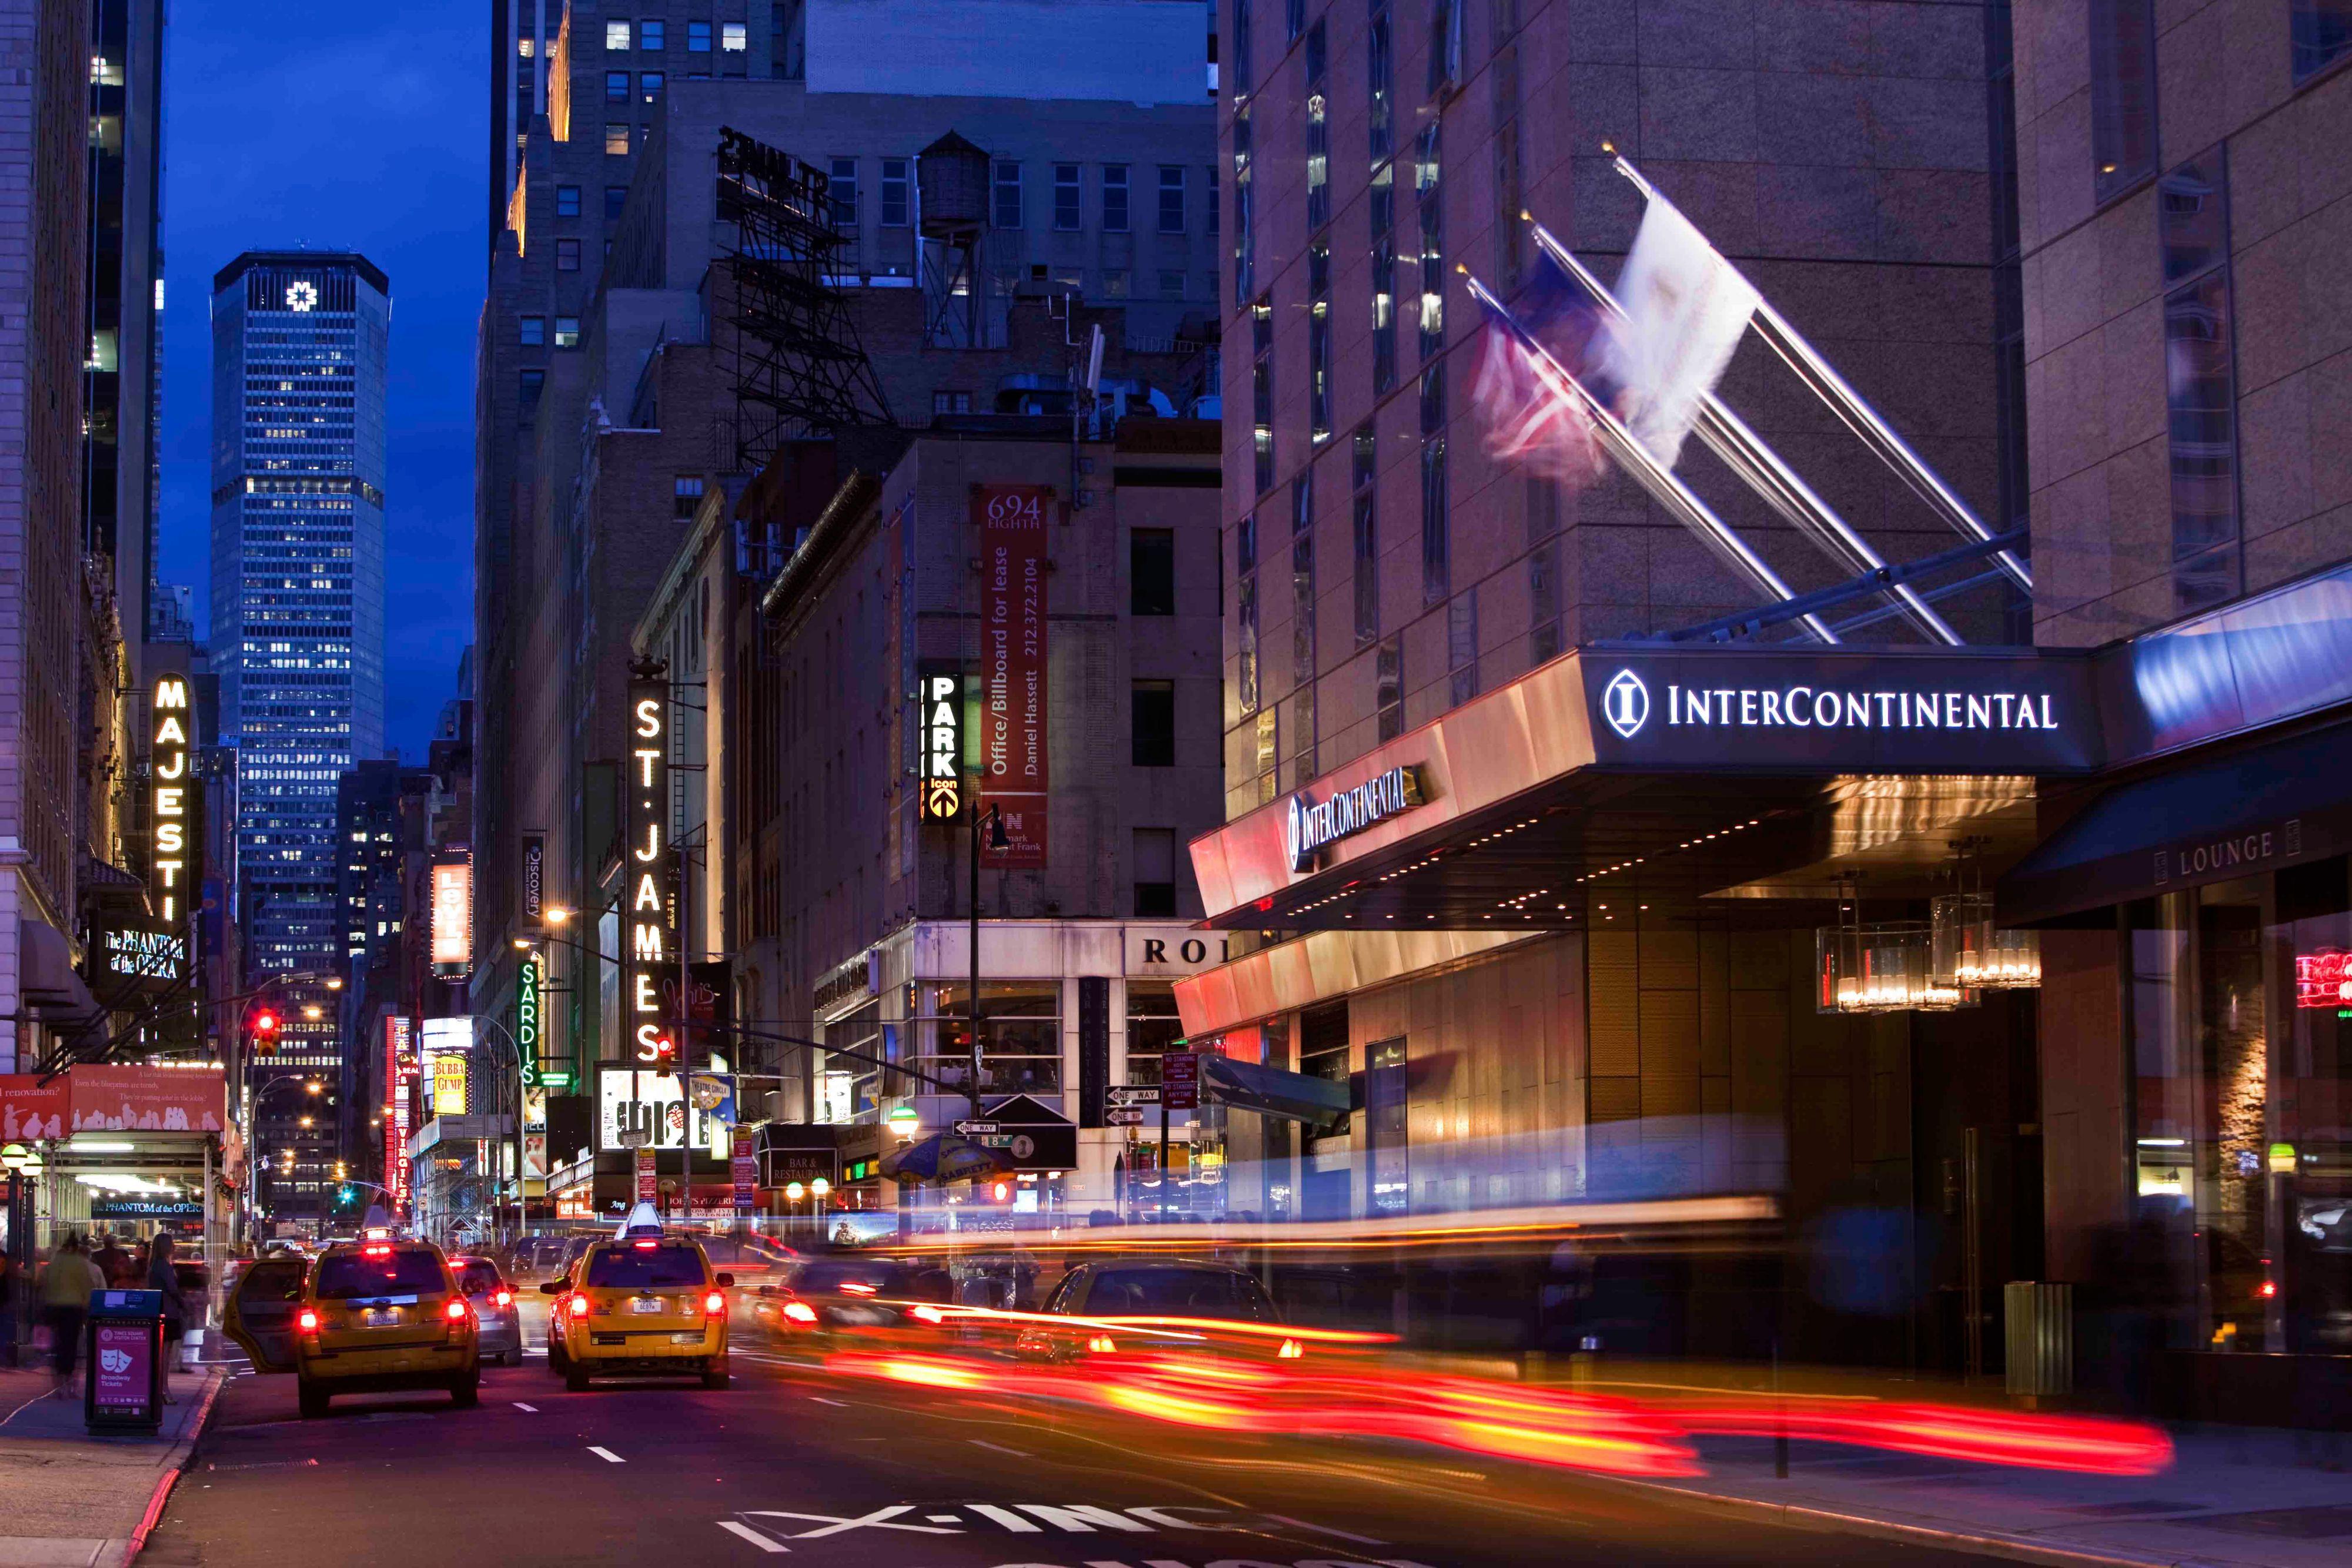 Intercontinental New York Times Square New York New York Ny Localdatabase Com